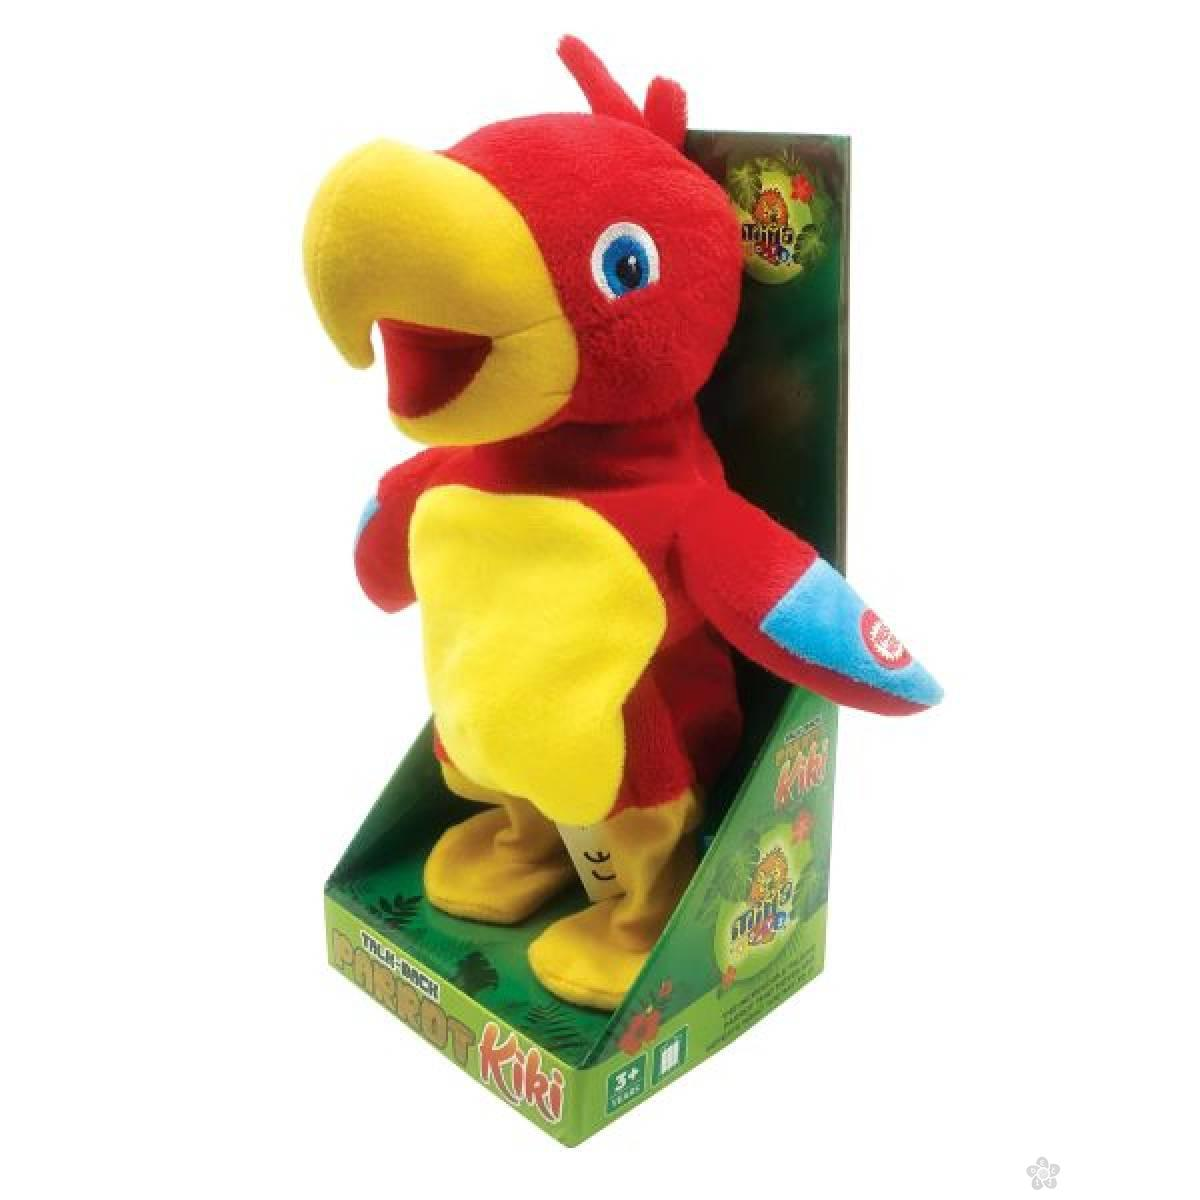 Plišani papagaj Kiki koji ponavlja reči